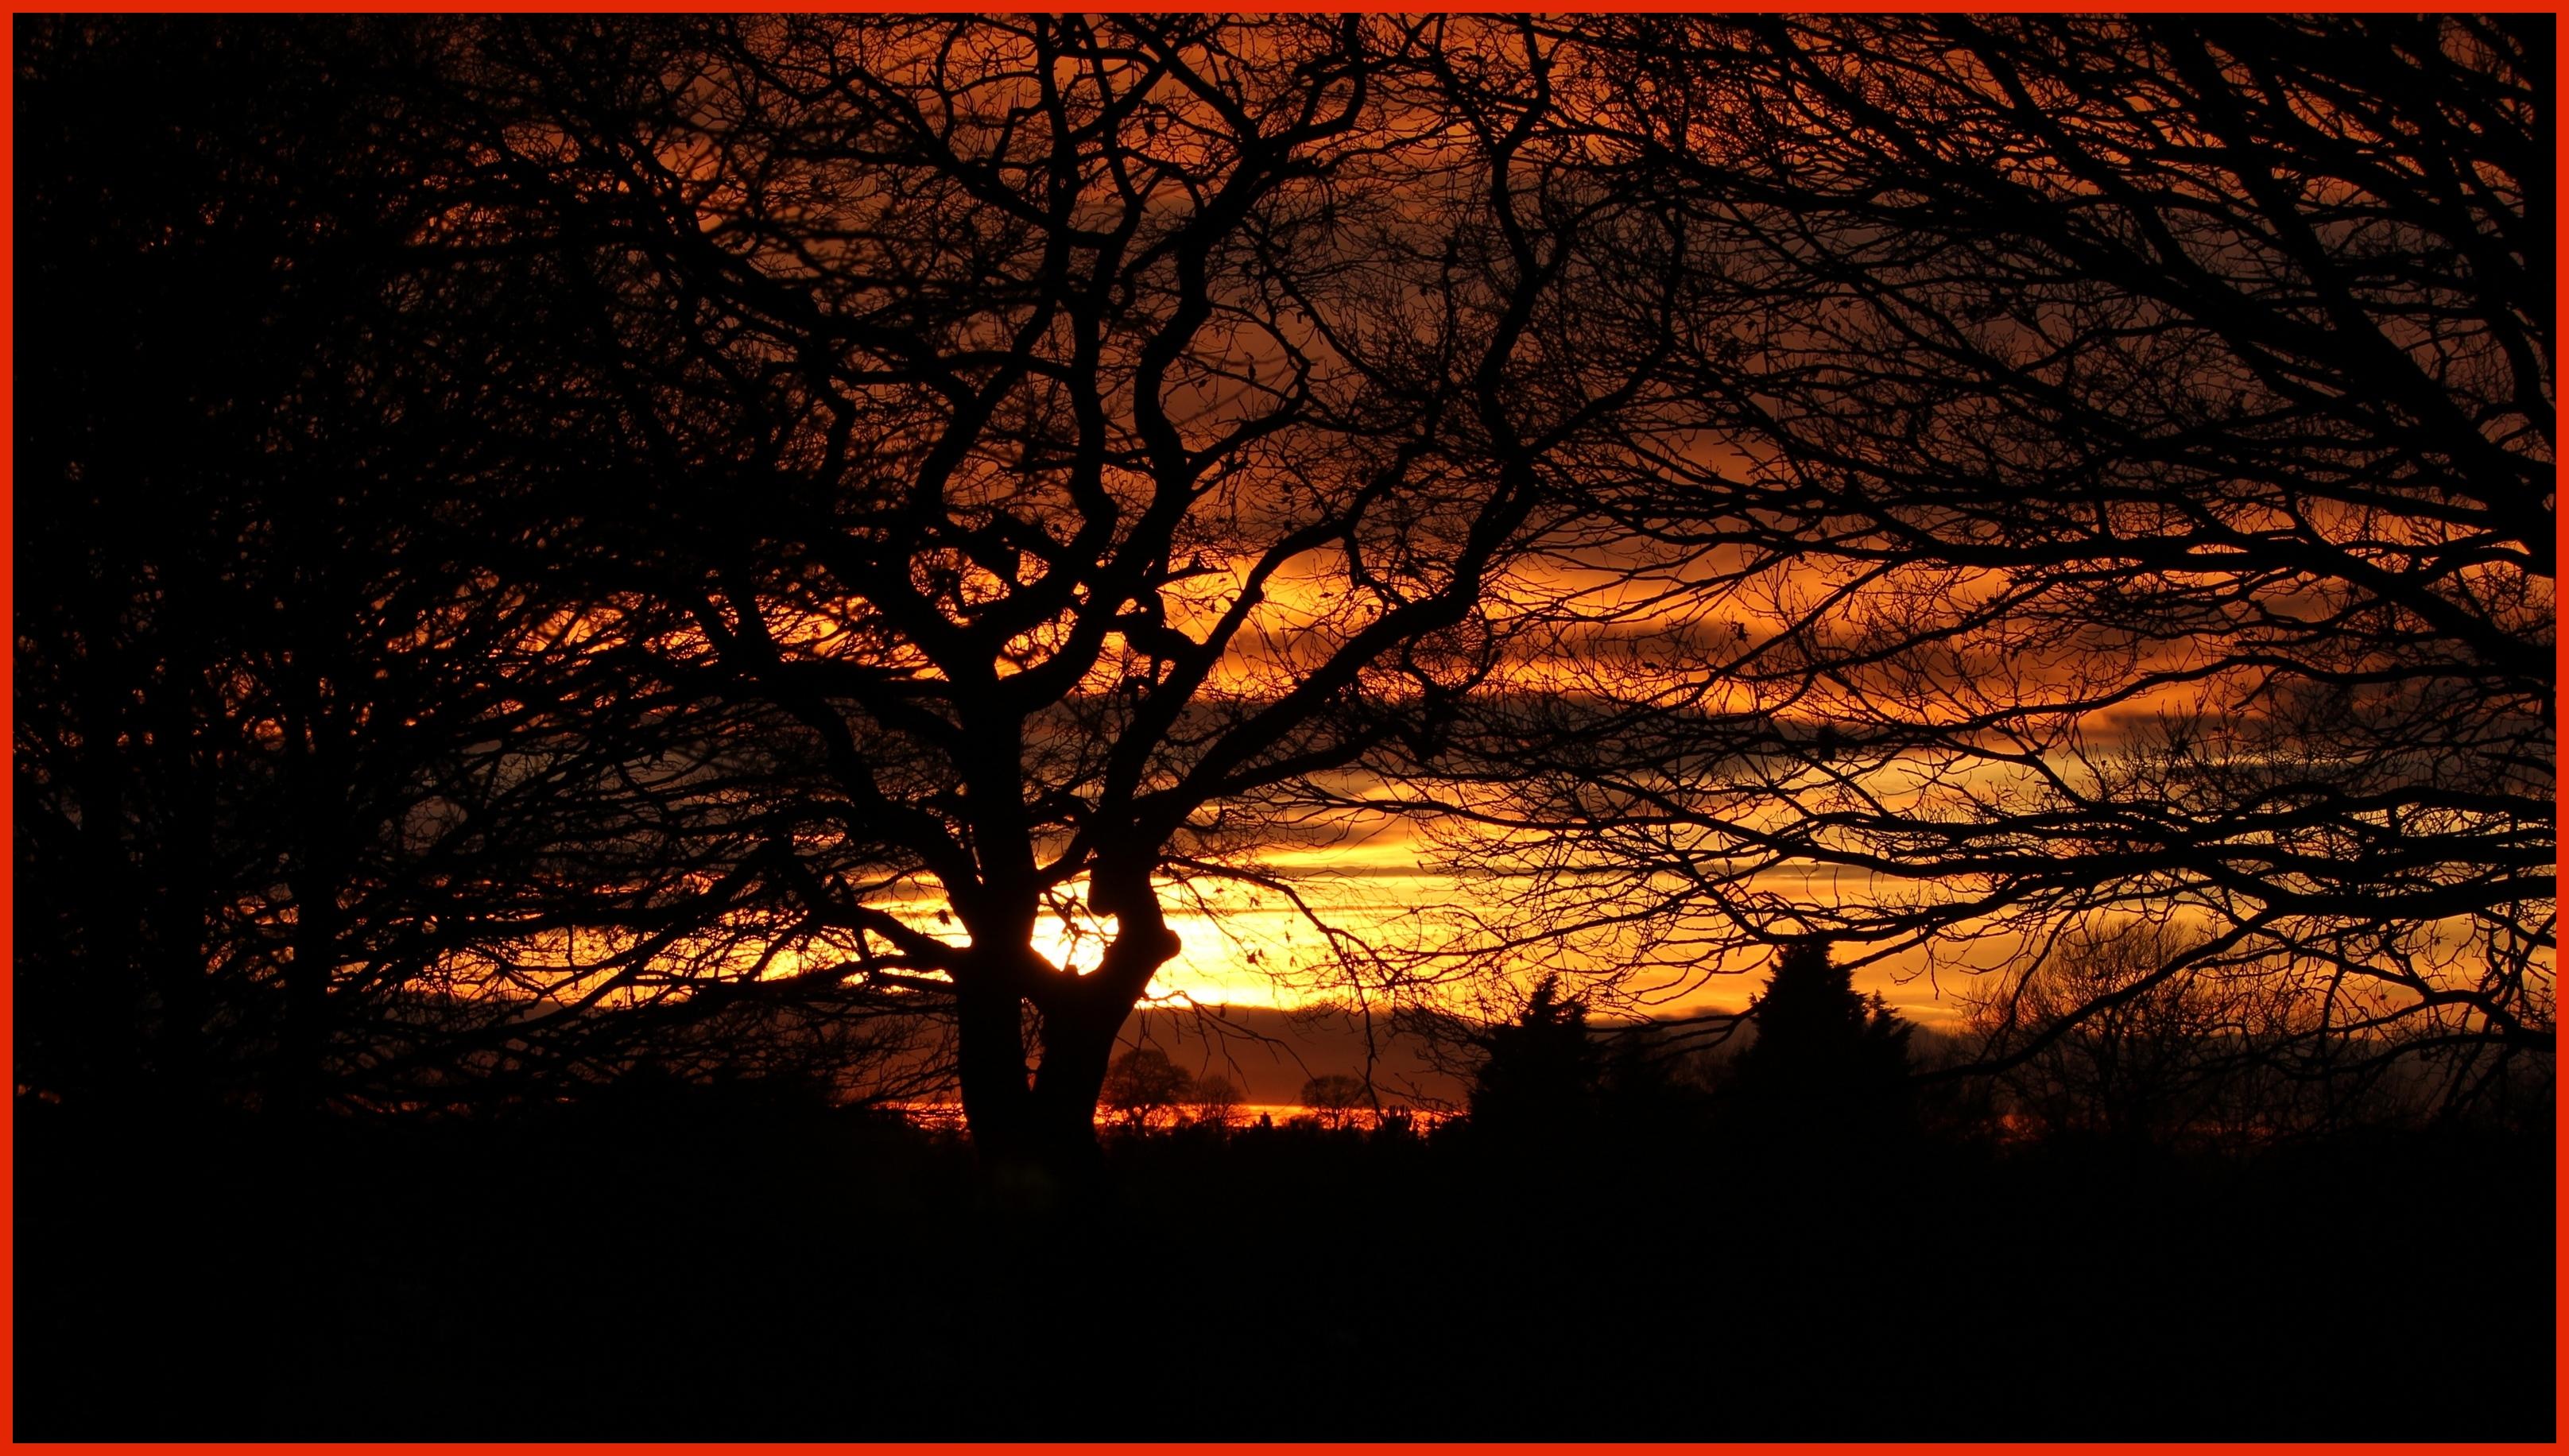 Sunset over wheelock. explored. photo